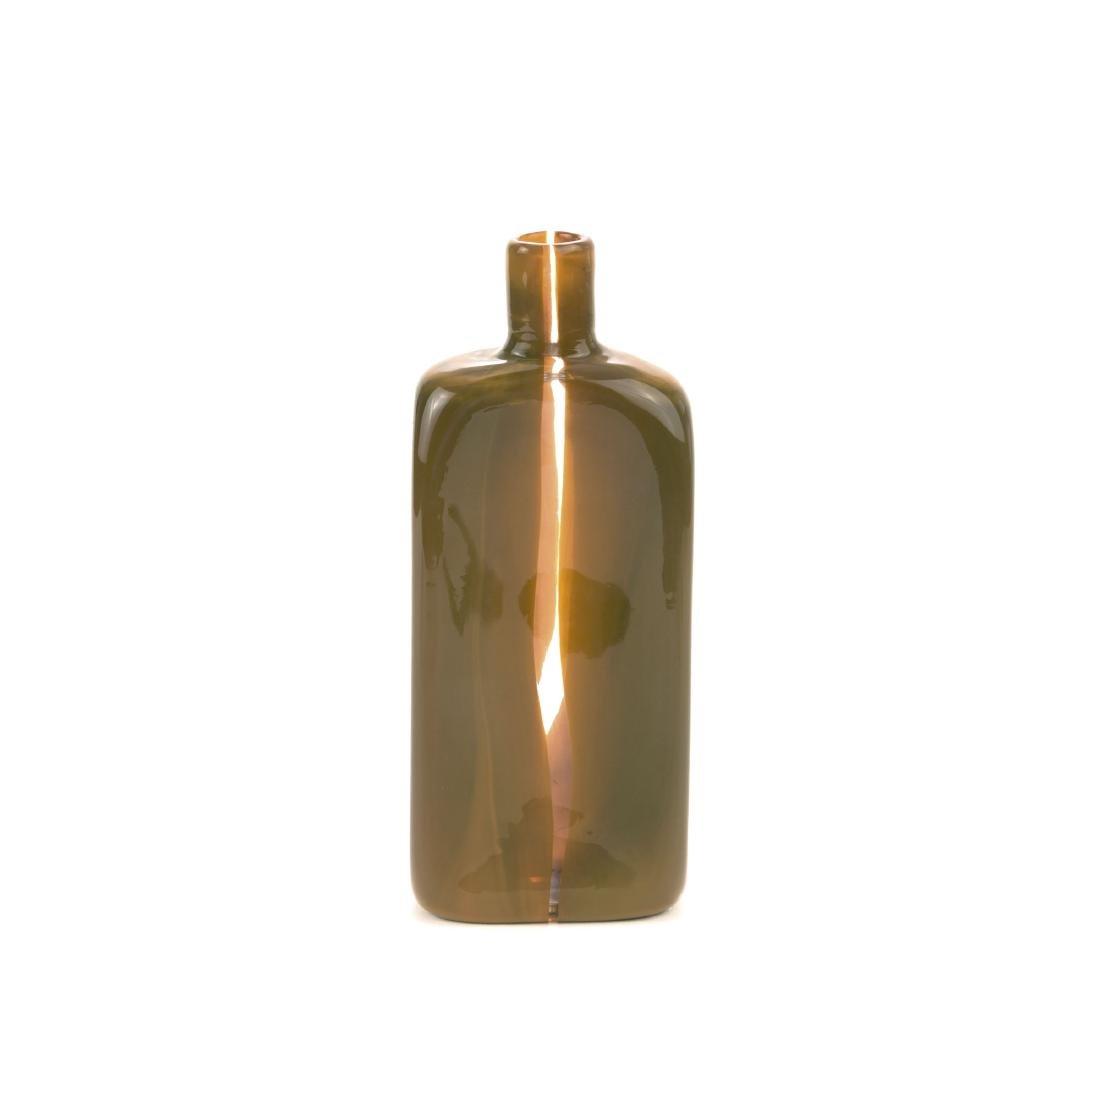 'Scolpito' vase, 1968